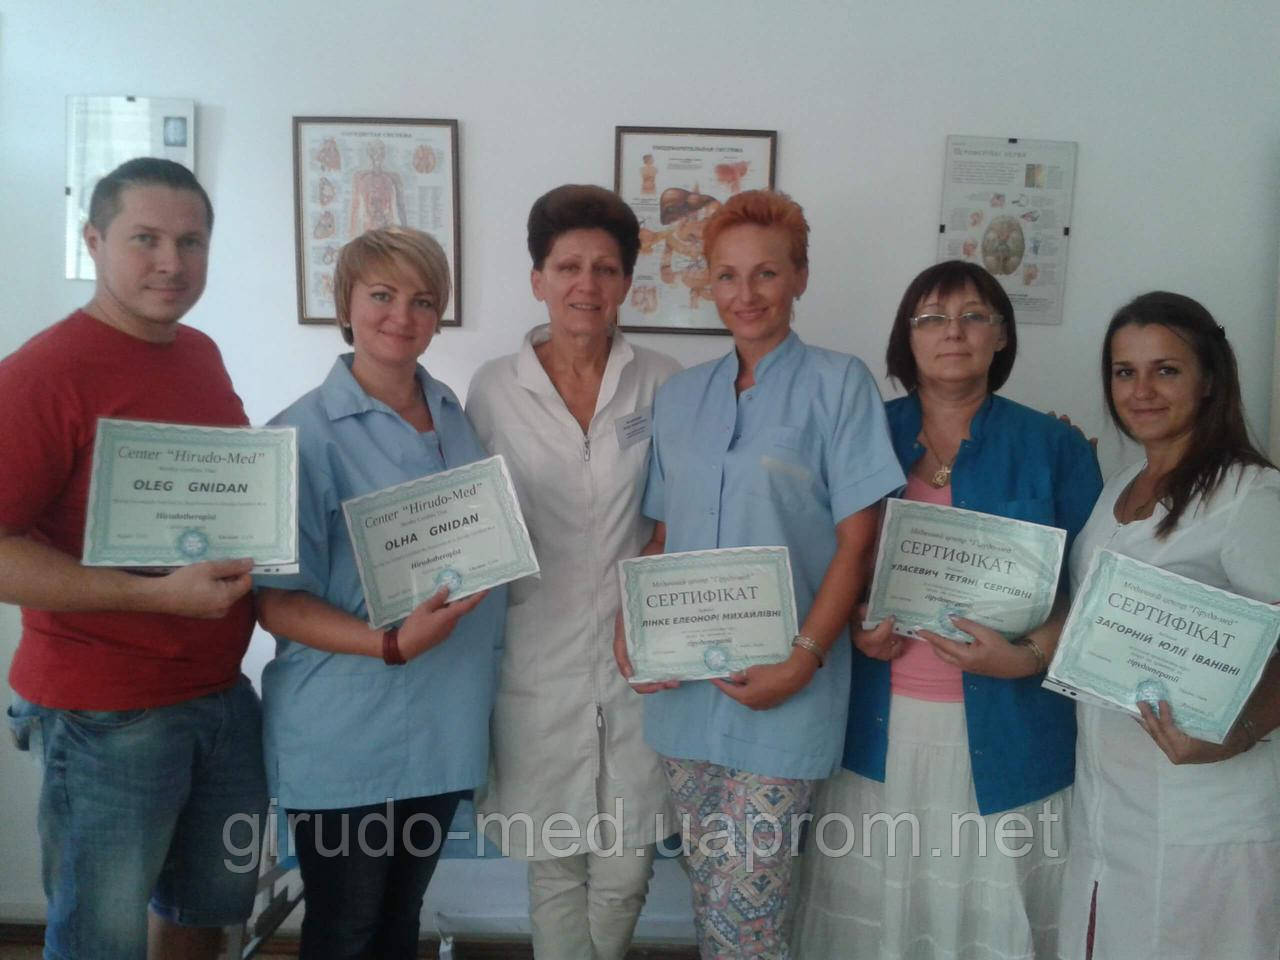 Pijawki lekarskie , Szkolenia , Kurs hirudoterapii